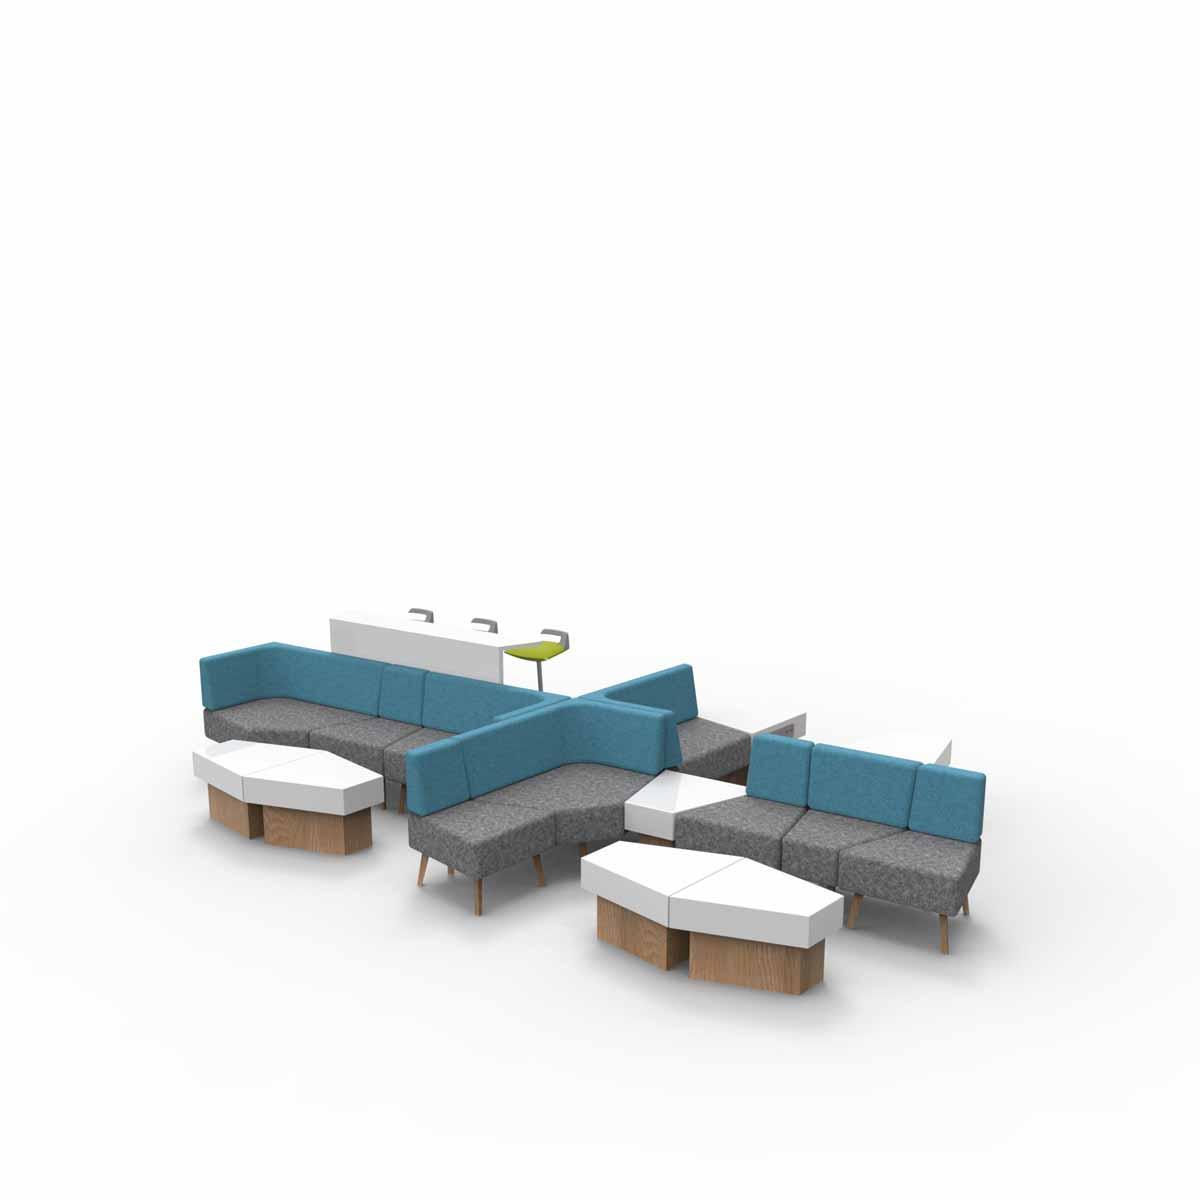 Trident Sofa工作岛沙发_酒店软